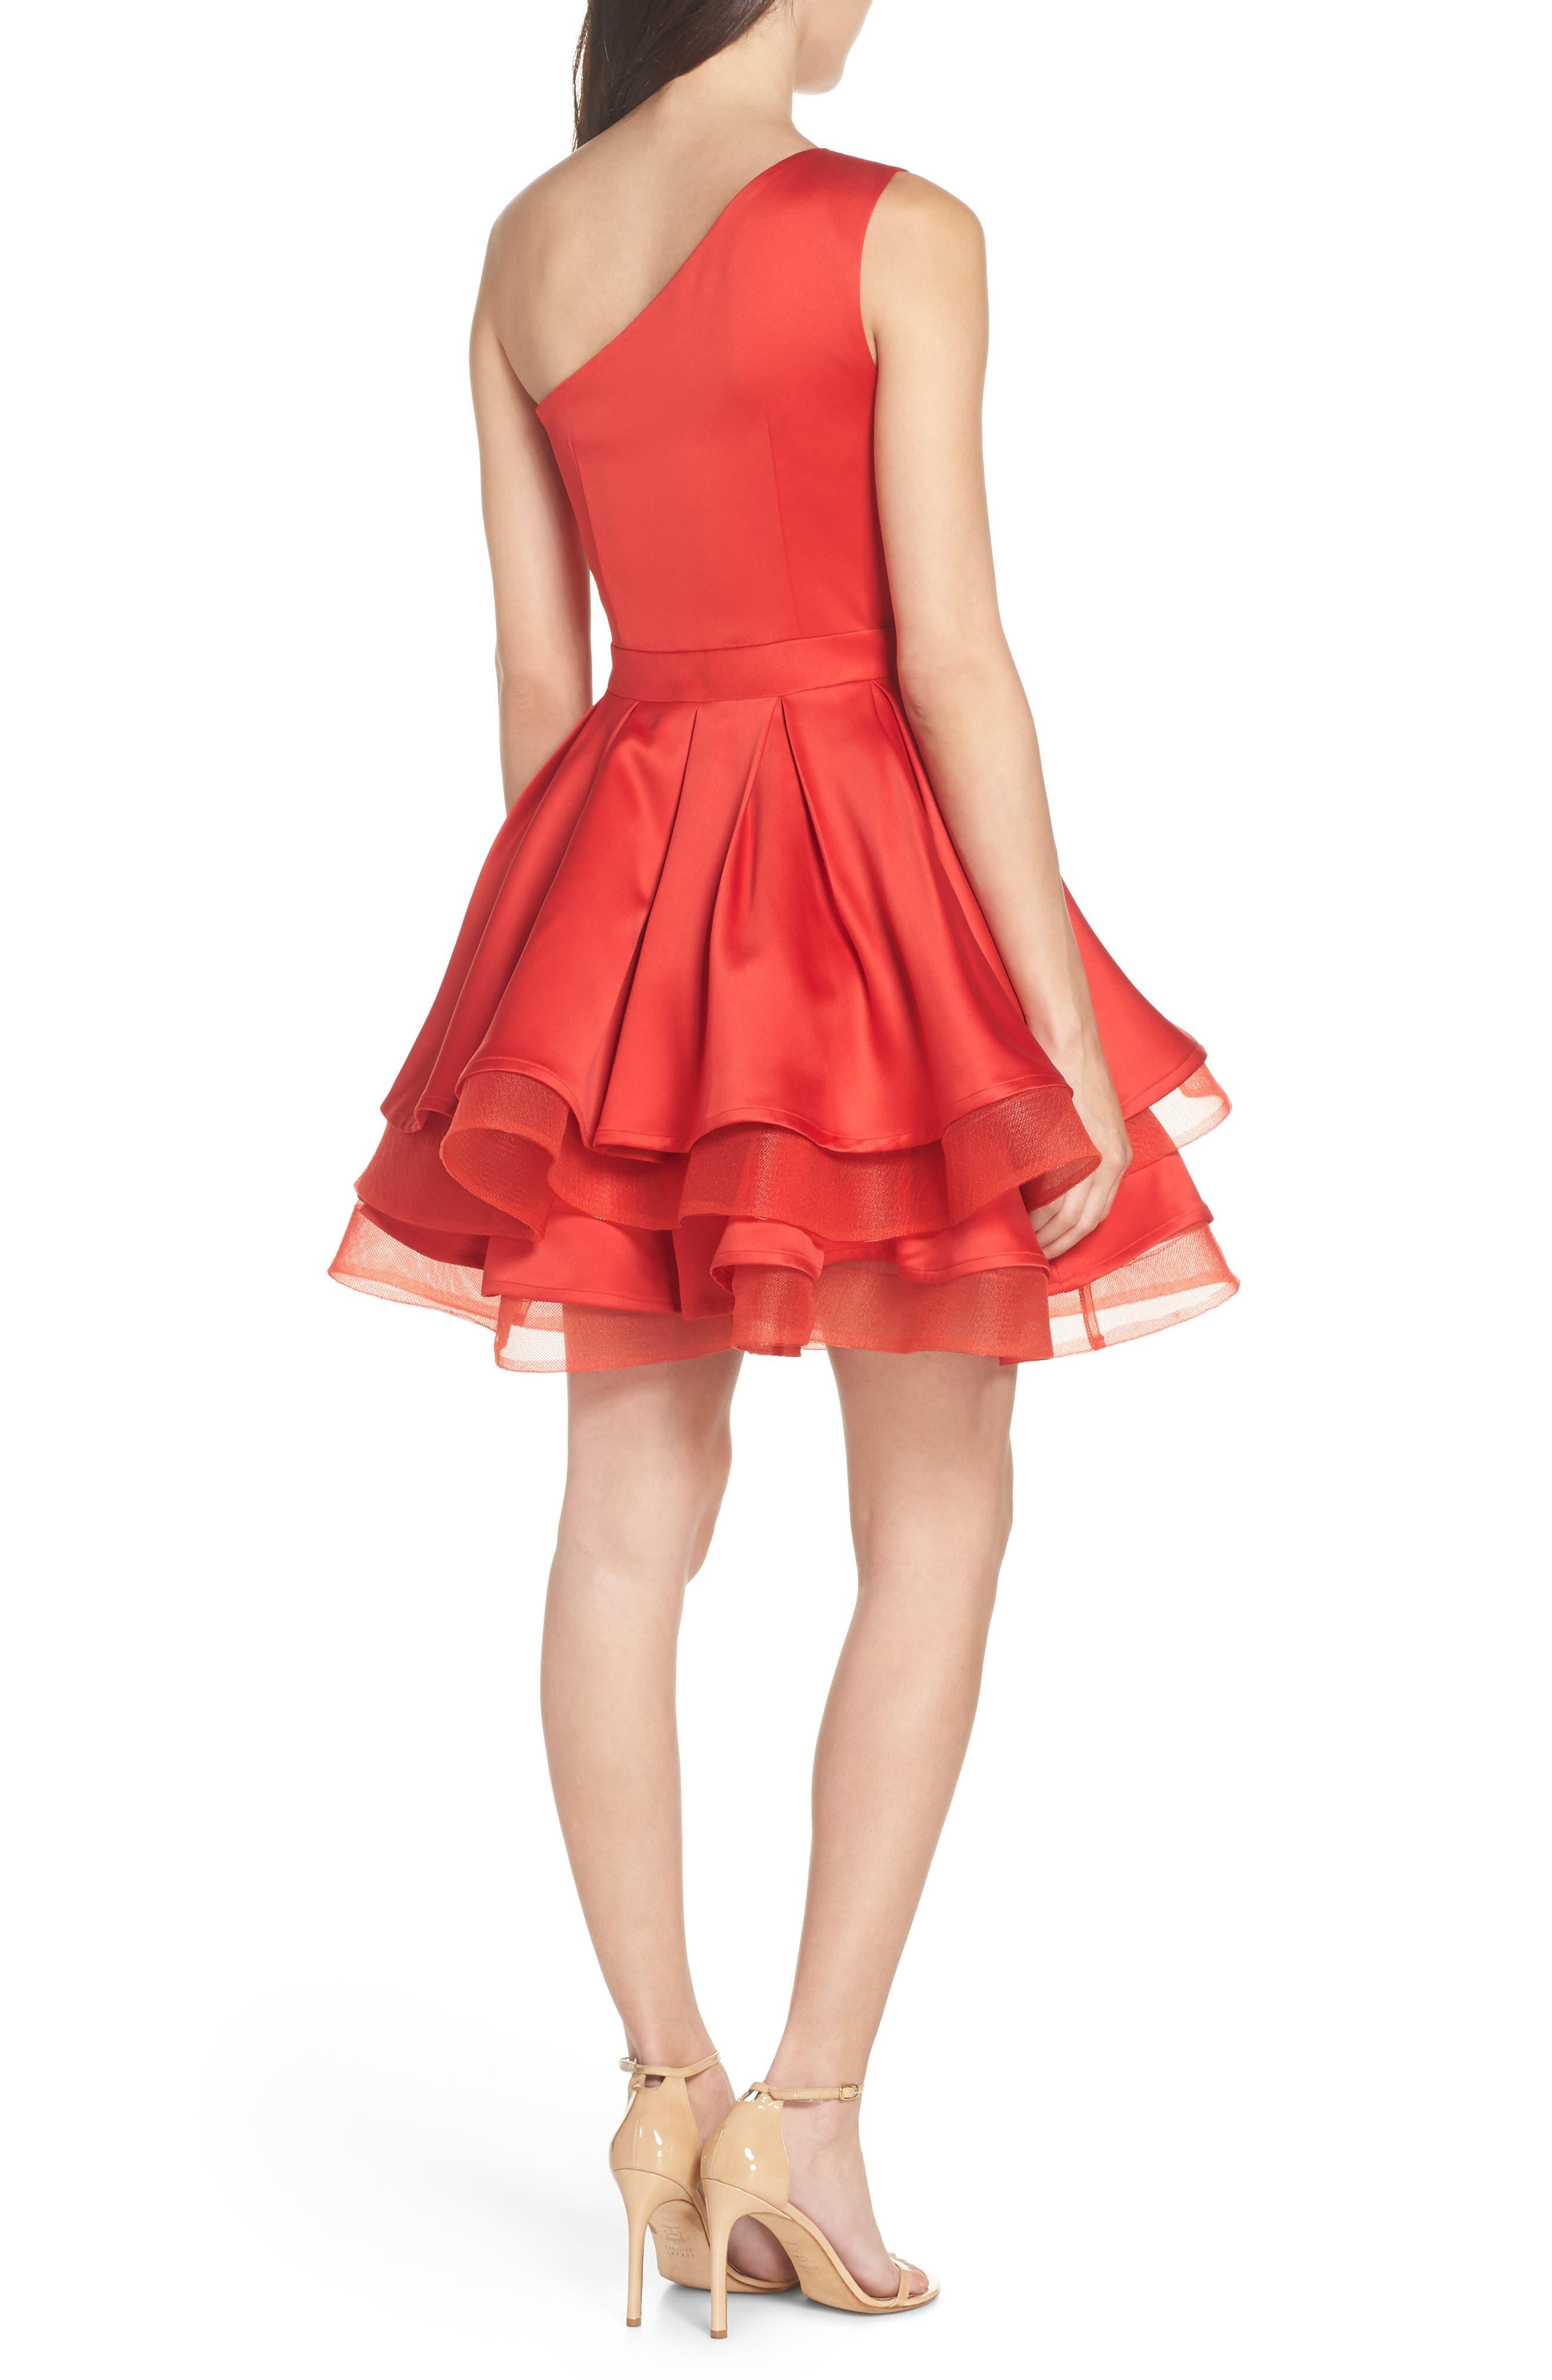 Emmanuel One-Shoulder Party Dress,                             Alternate thumbnail 2, color,                             600